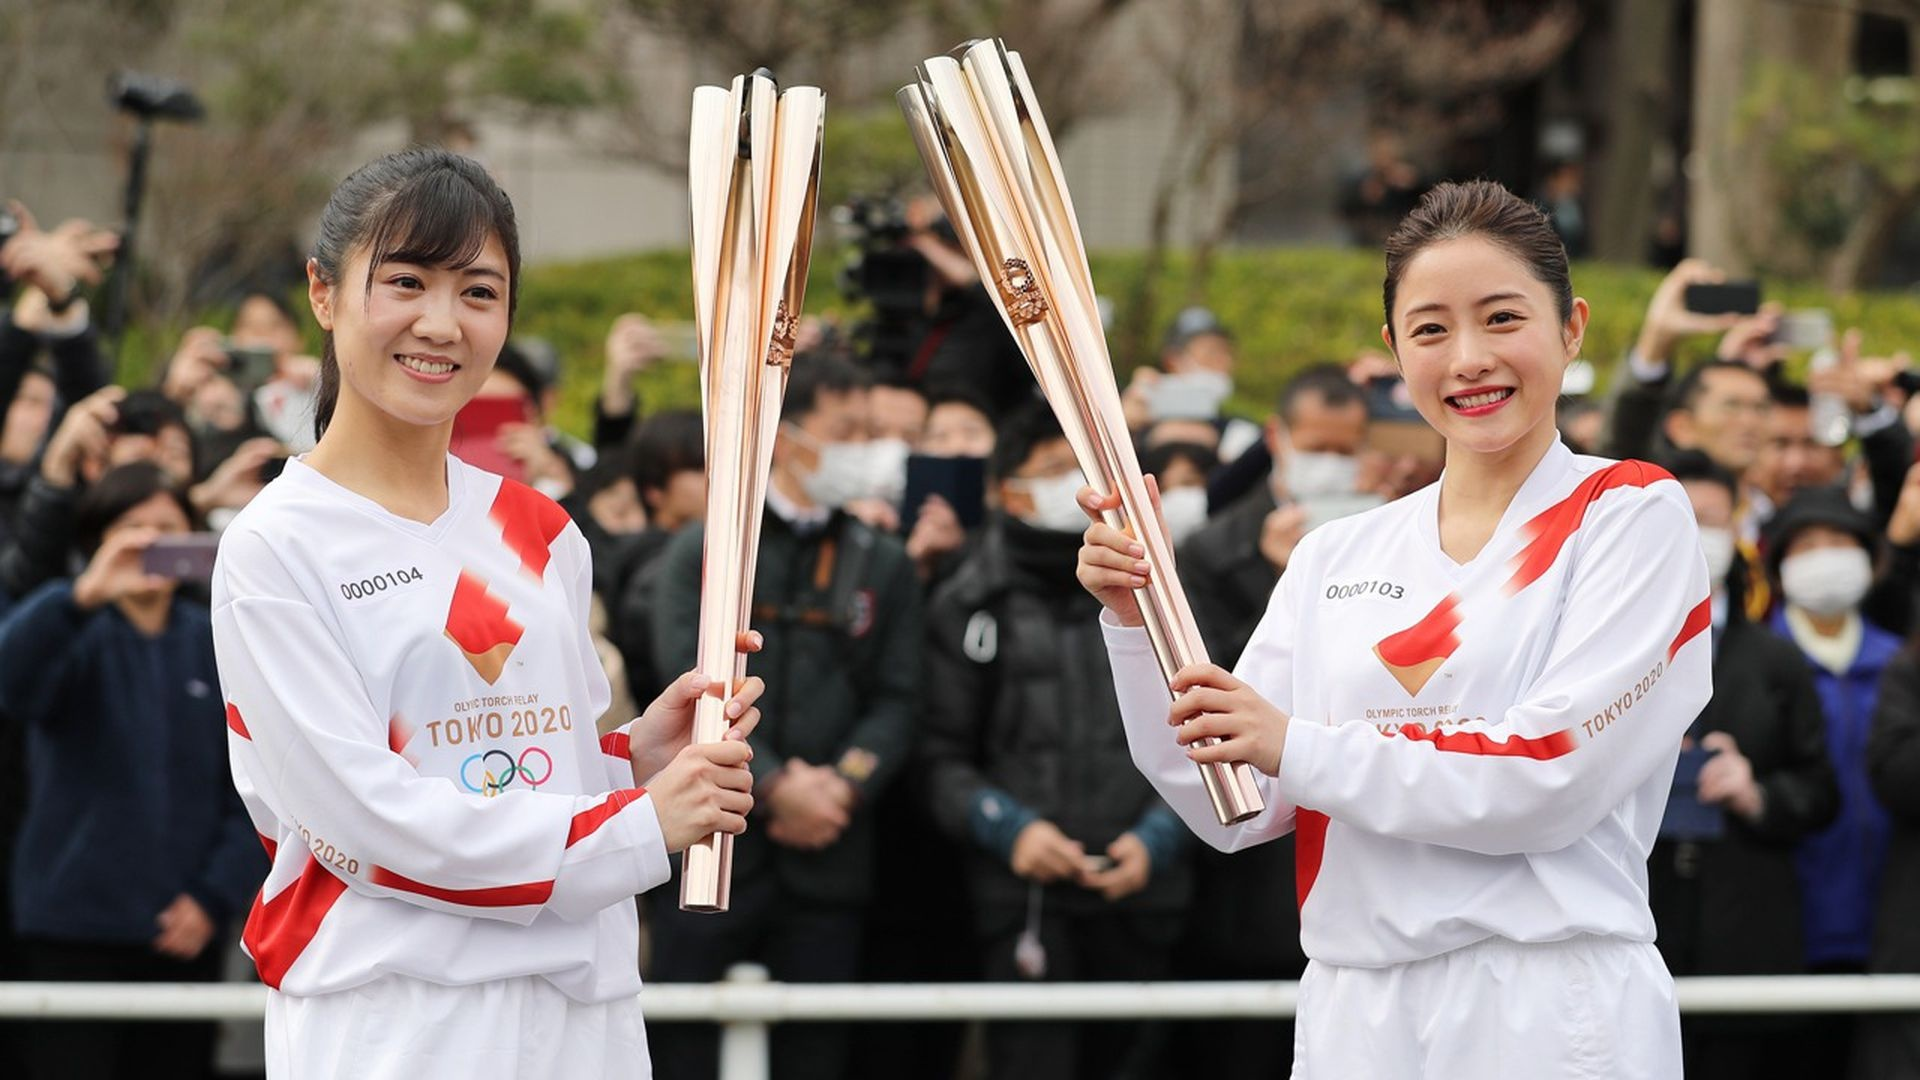 Tokyo 2020 Olympics best wallpaper